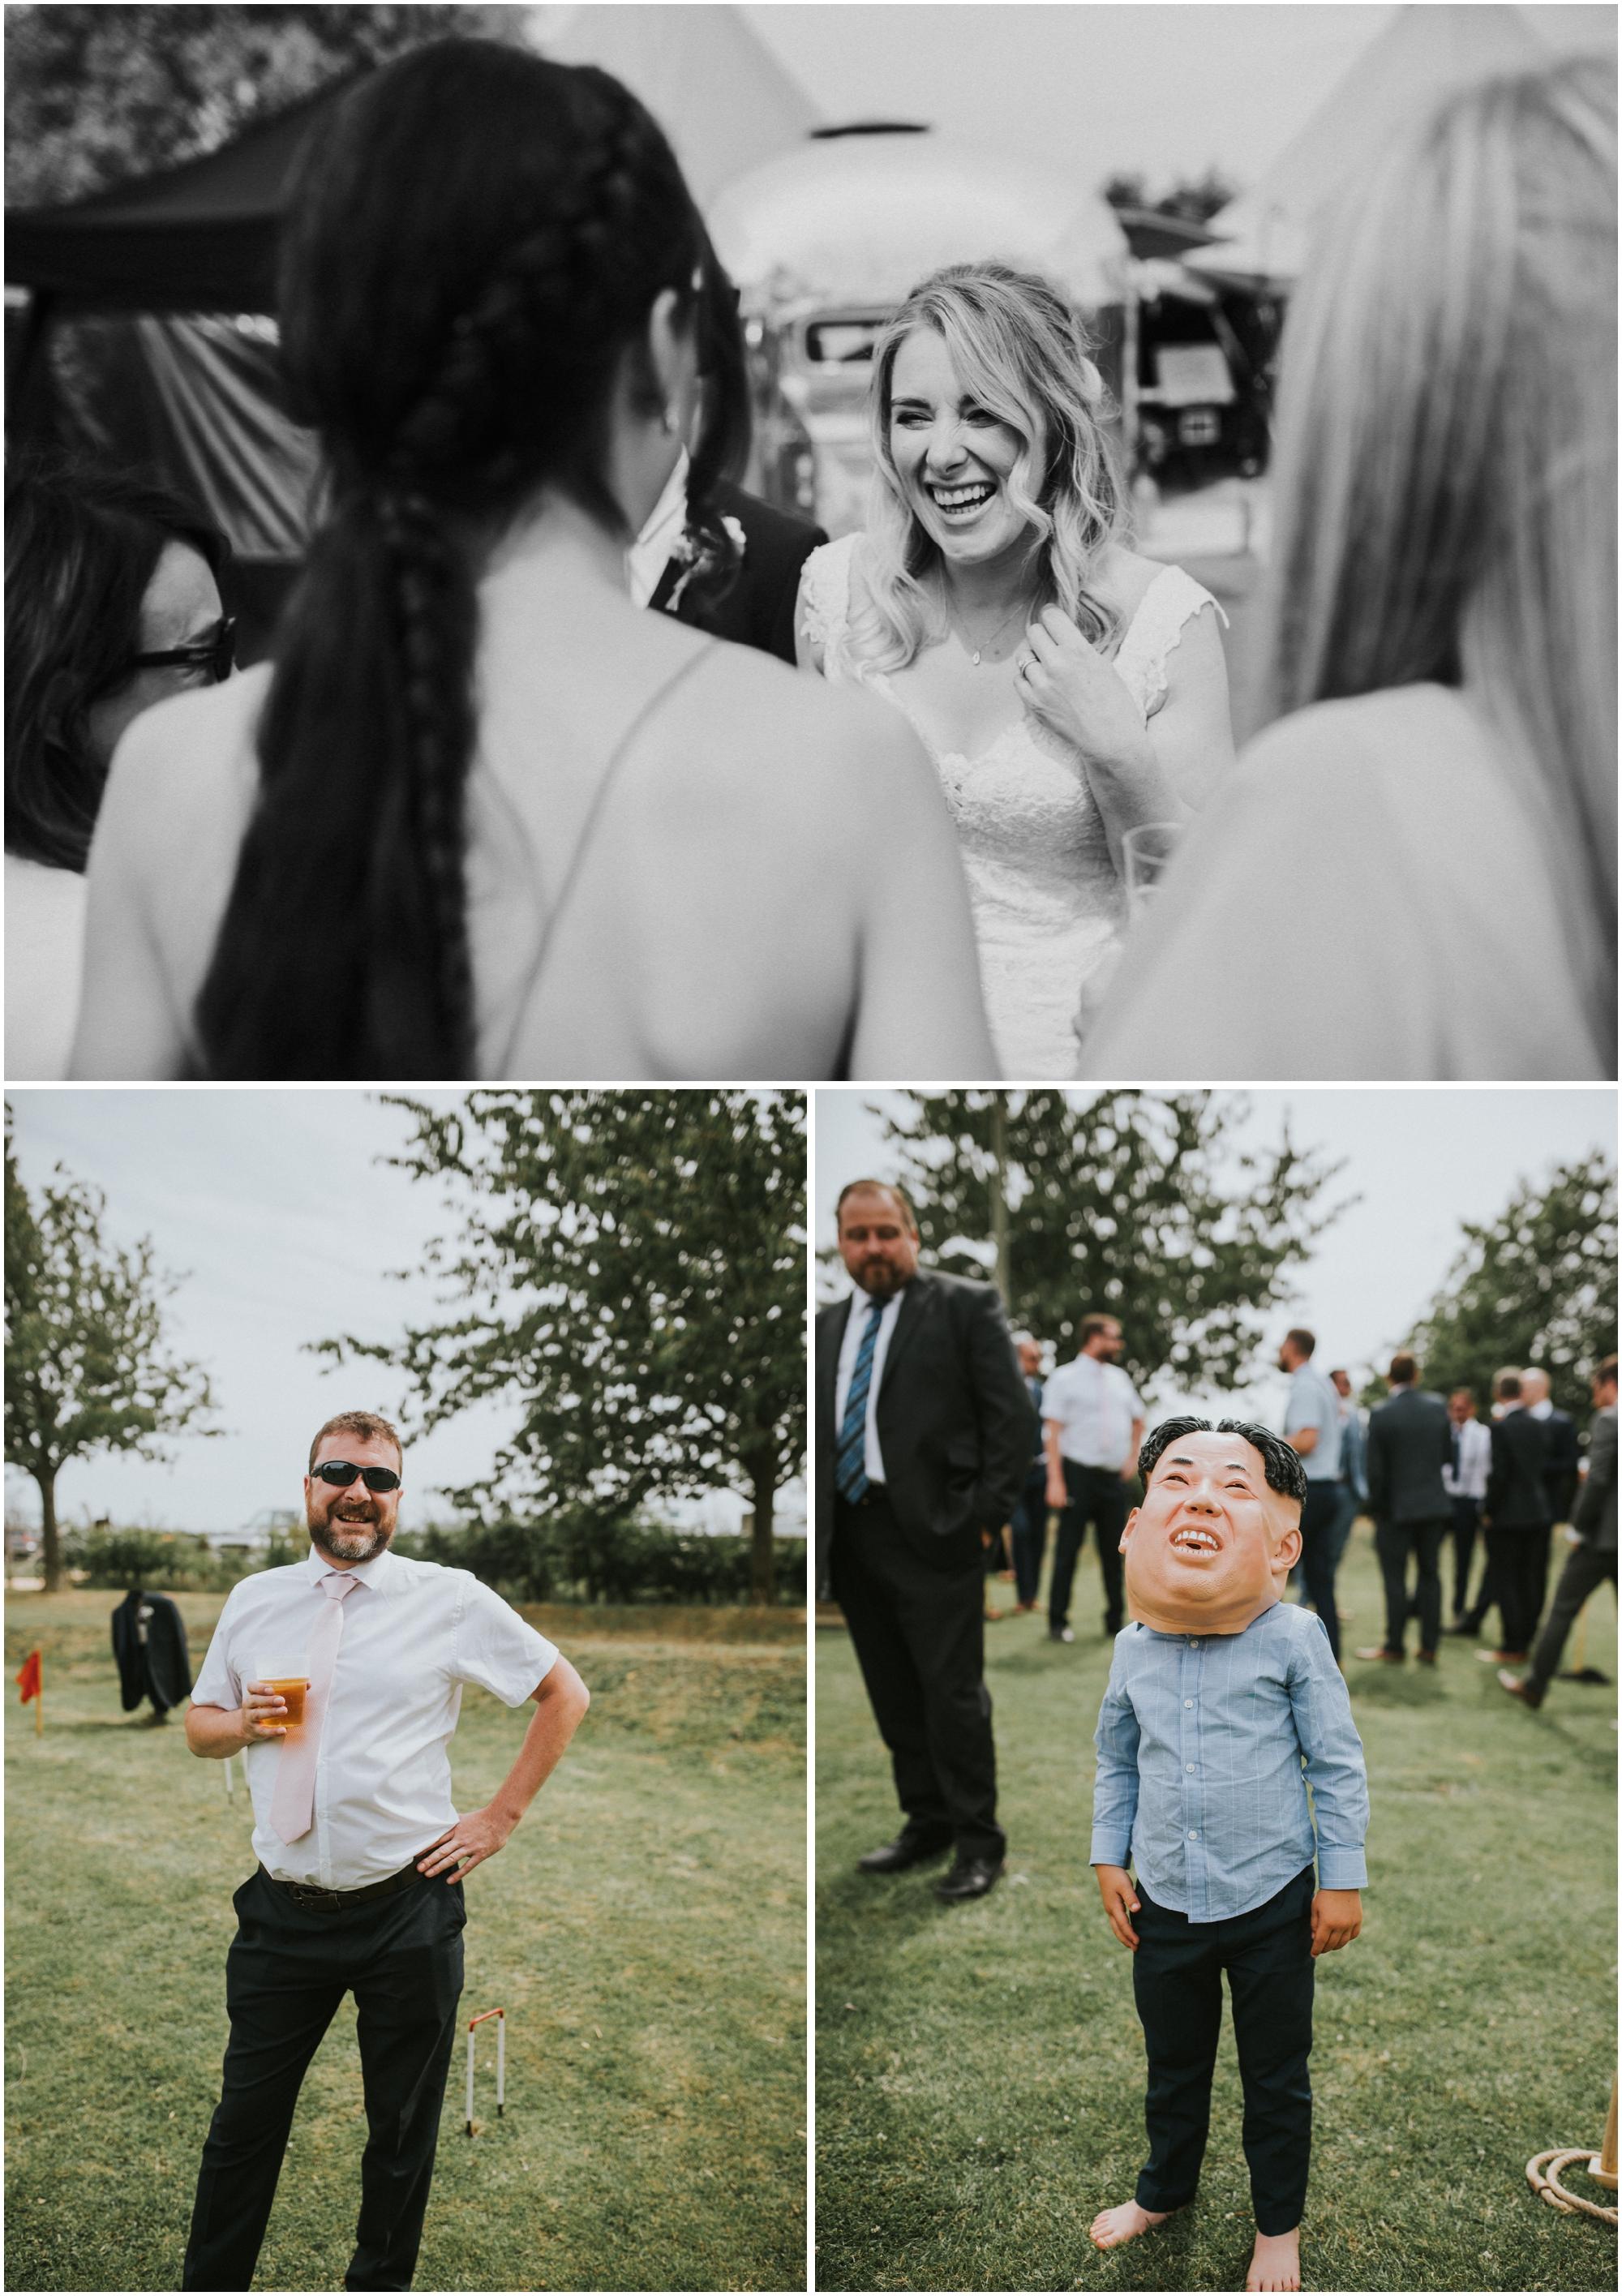 SkipbridegFarmWedding-LukeHolroyd-Yorkshirewedding_0074.jpg